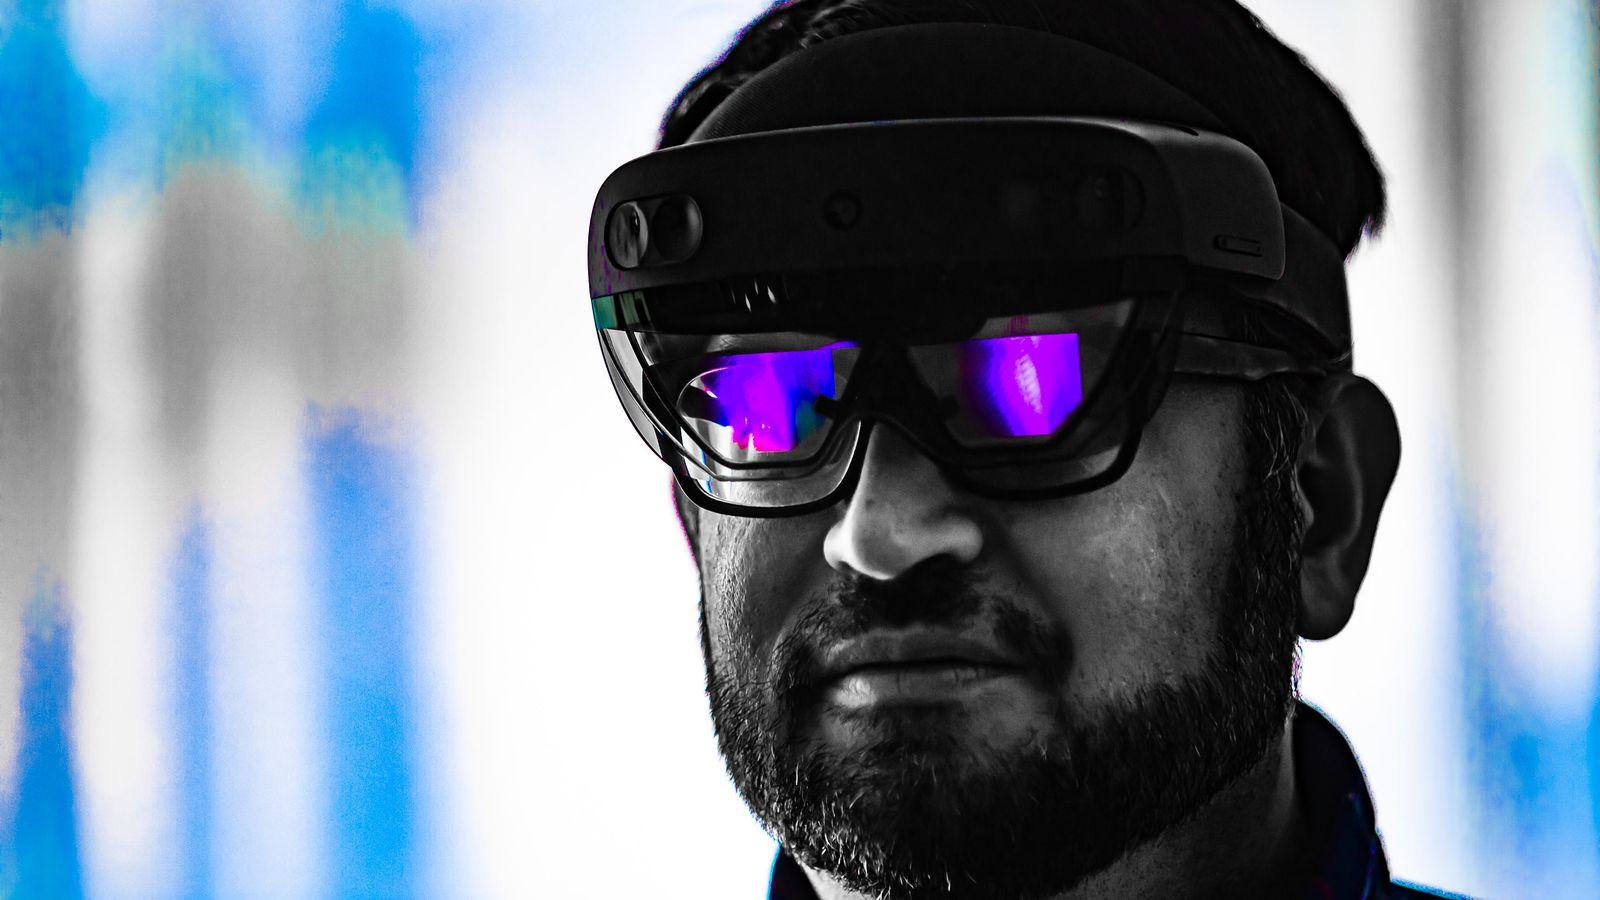 Microsoft HoloLens 2 ufficiale: Mixed Reality a un nuovo livello ma ancora a $3500 2